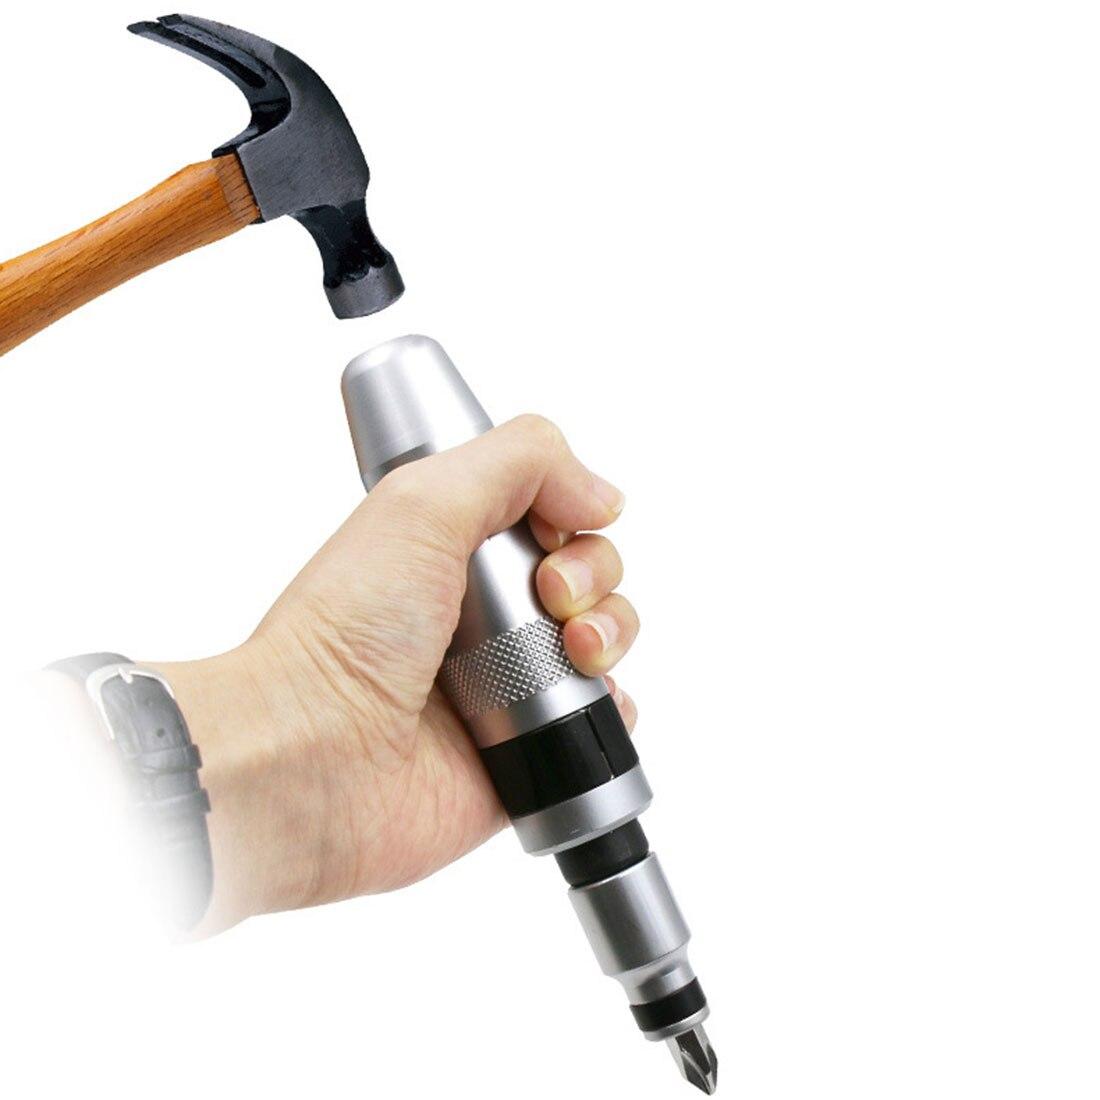 7pcs Multi-purpose Heavy Duty Shock Screw Driver Chisel Bits Tools Socket Kit Impact Screwdriver Set With Case Flat